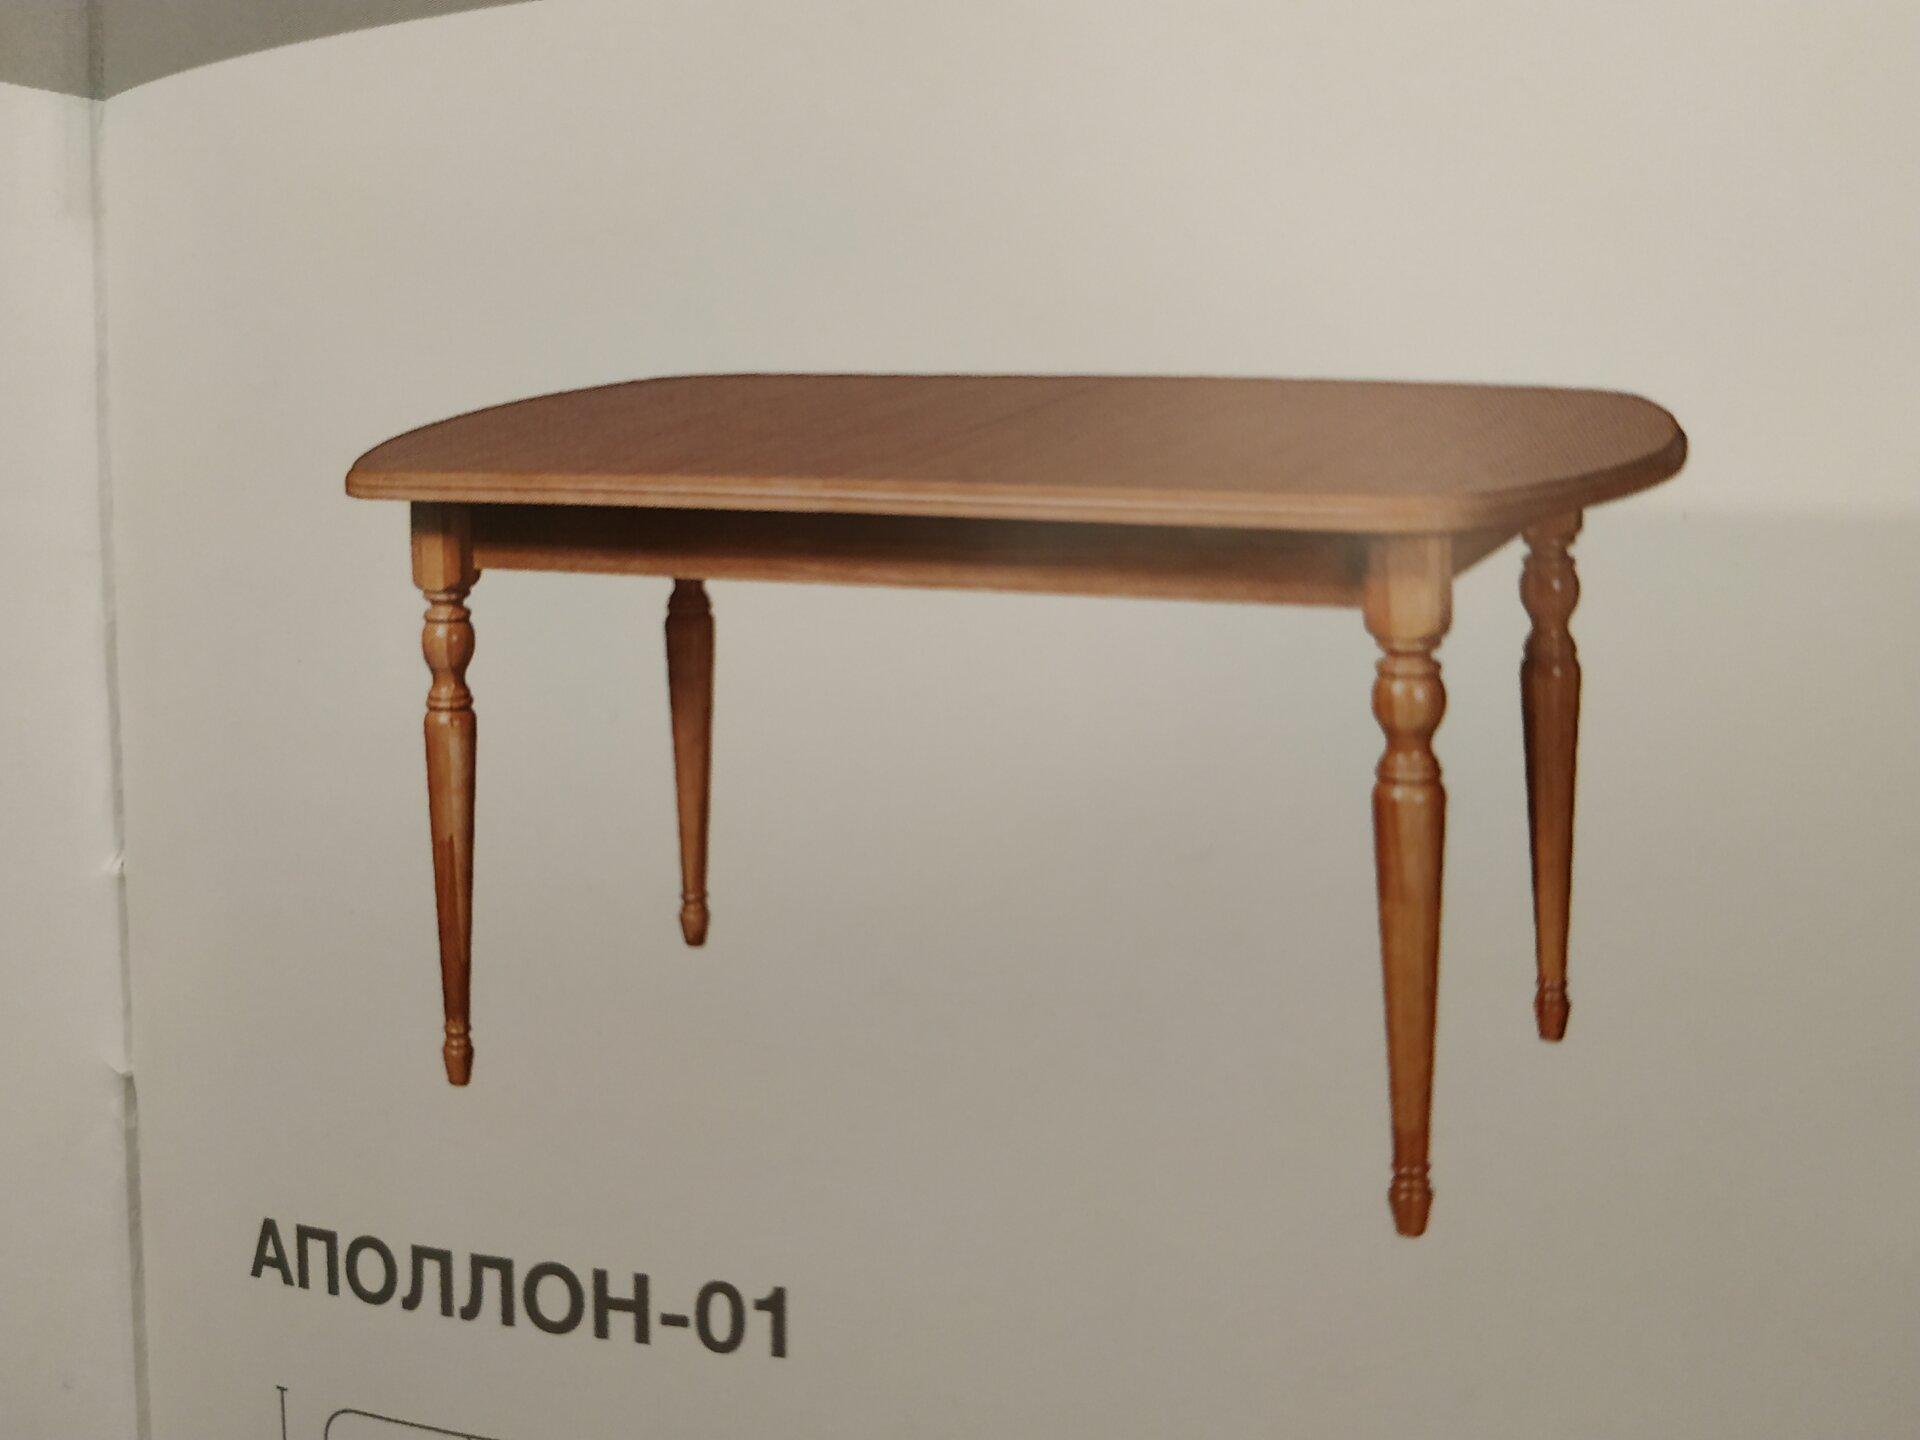 Стол кухонный, Аполлон-01 дуб Р-43, деревянный, раздвижной (95*152/192 см) - фото pic_7f2e93dbfc6c9faeaed553d552e18d32_1920x9000_1.jpg